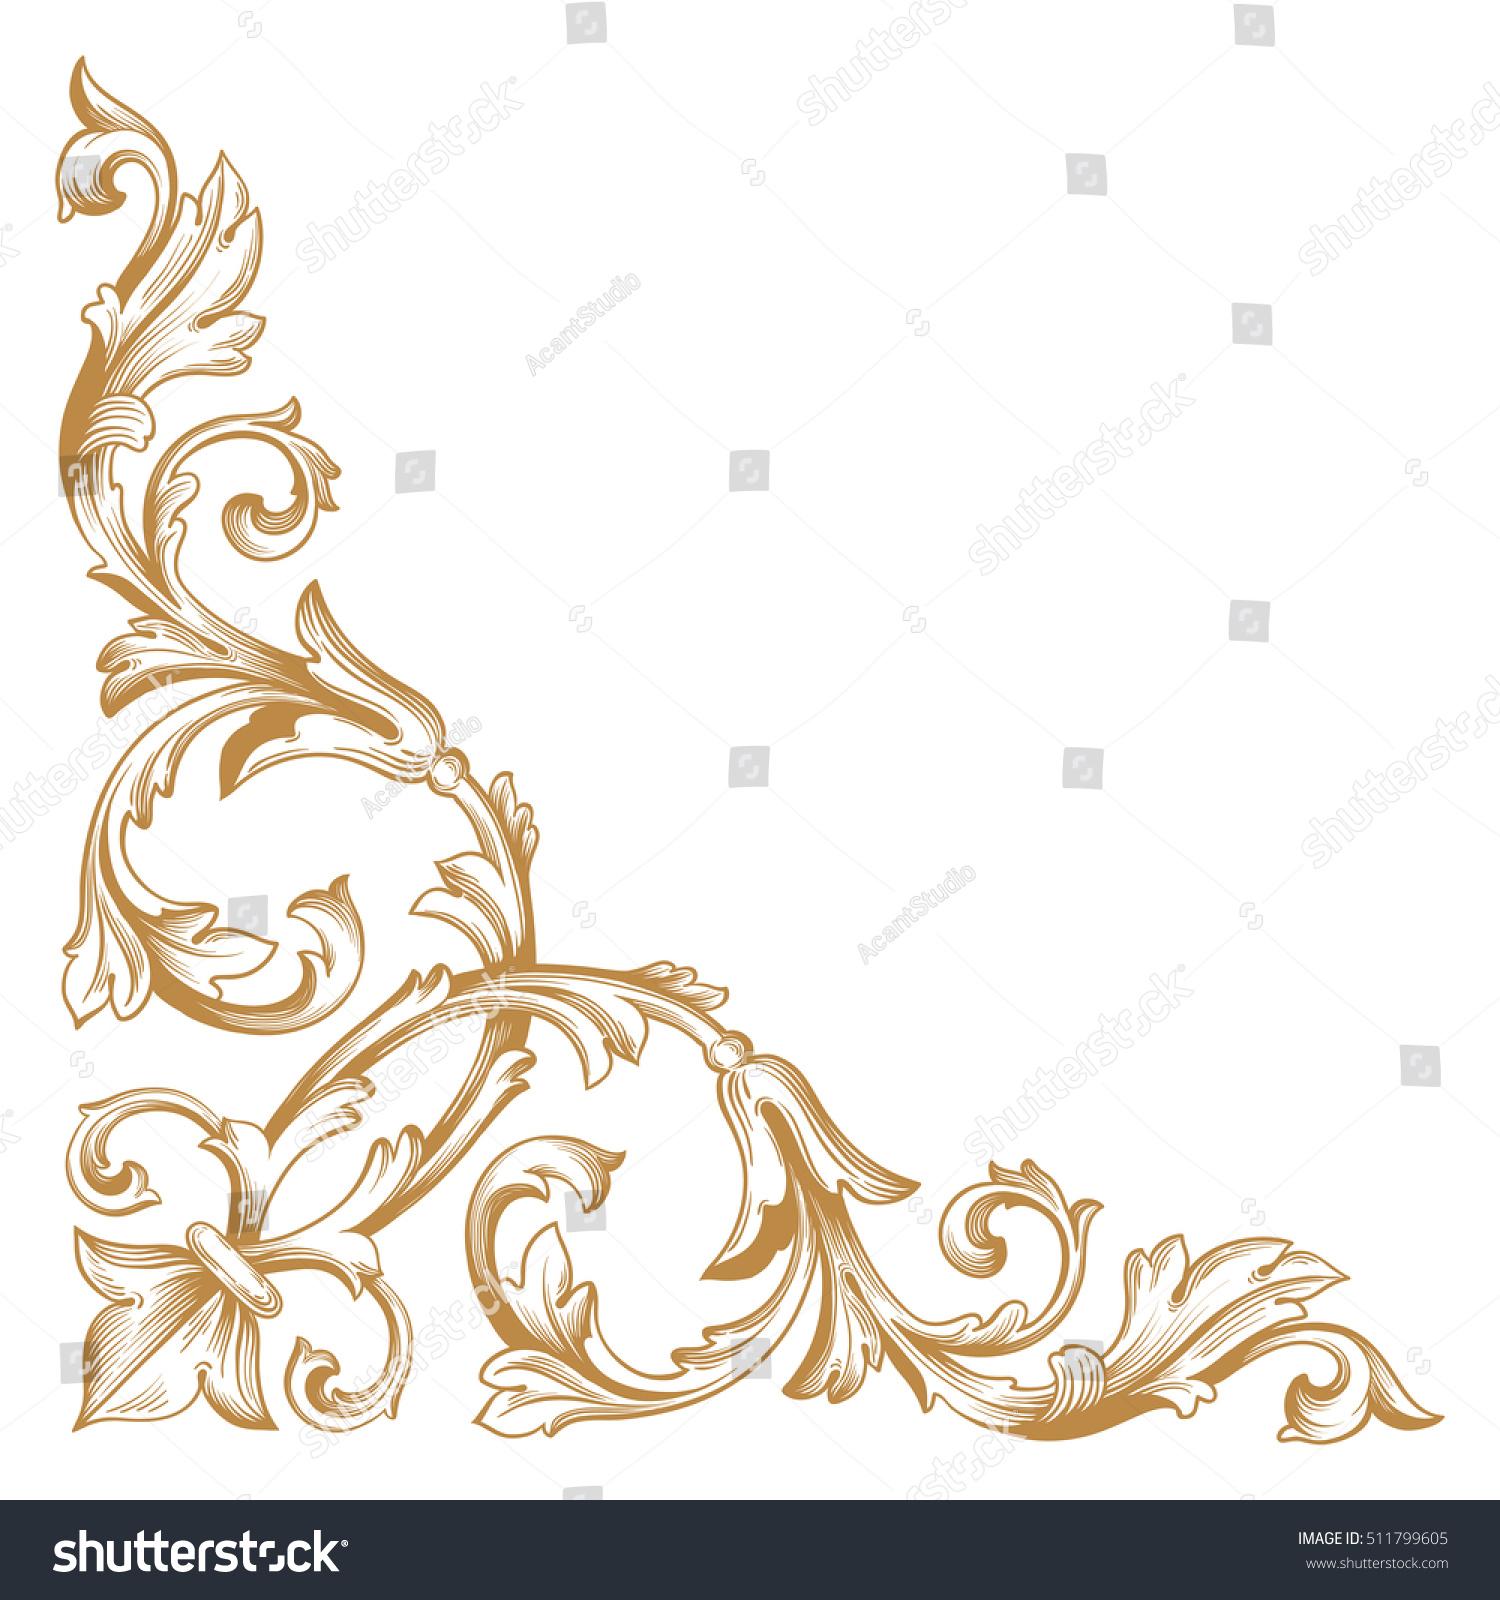 royalty free gold vintage baroque corner ornament 511799605 stock